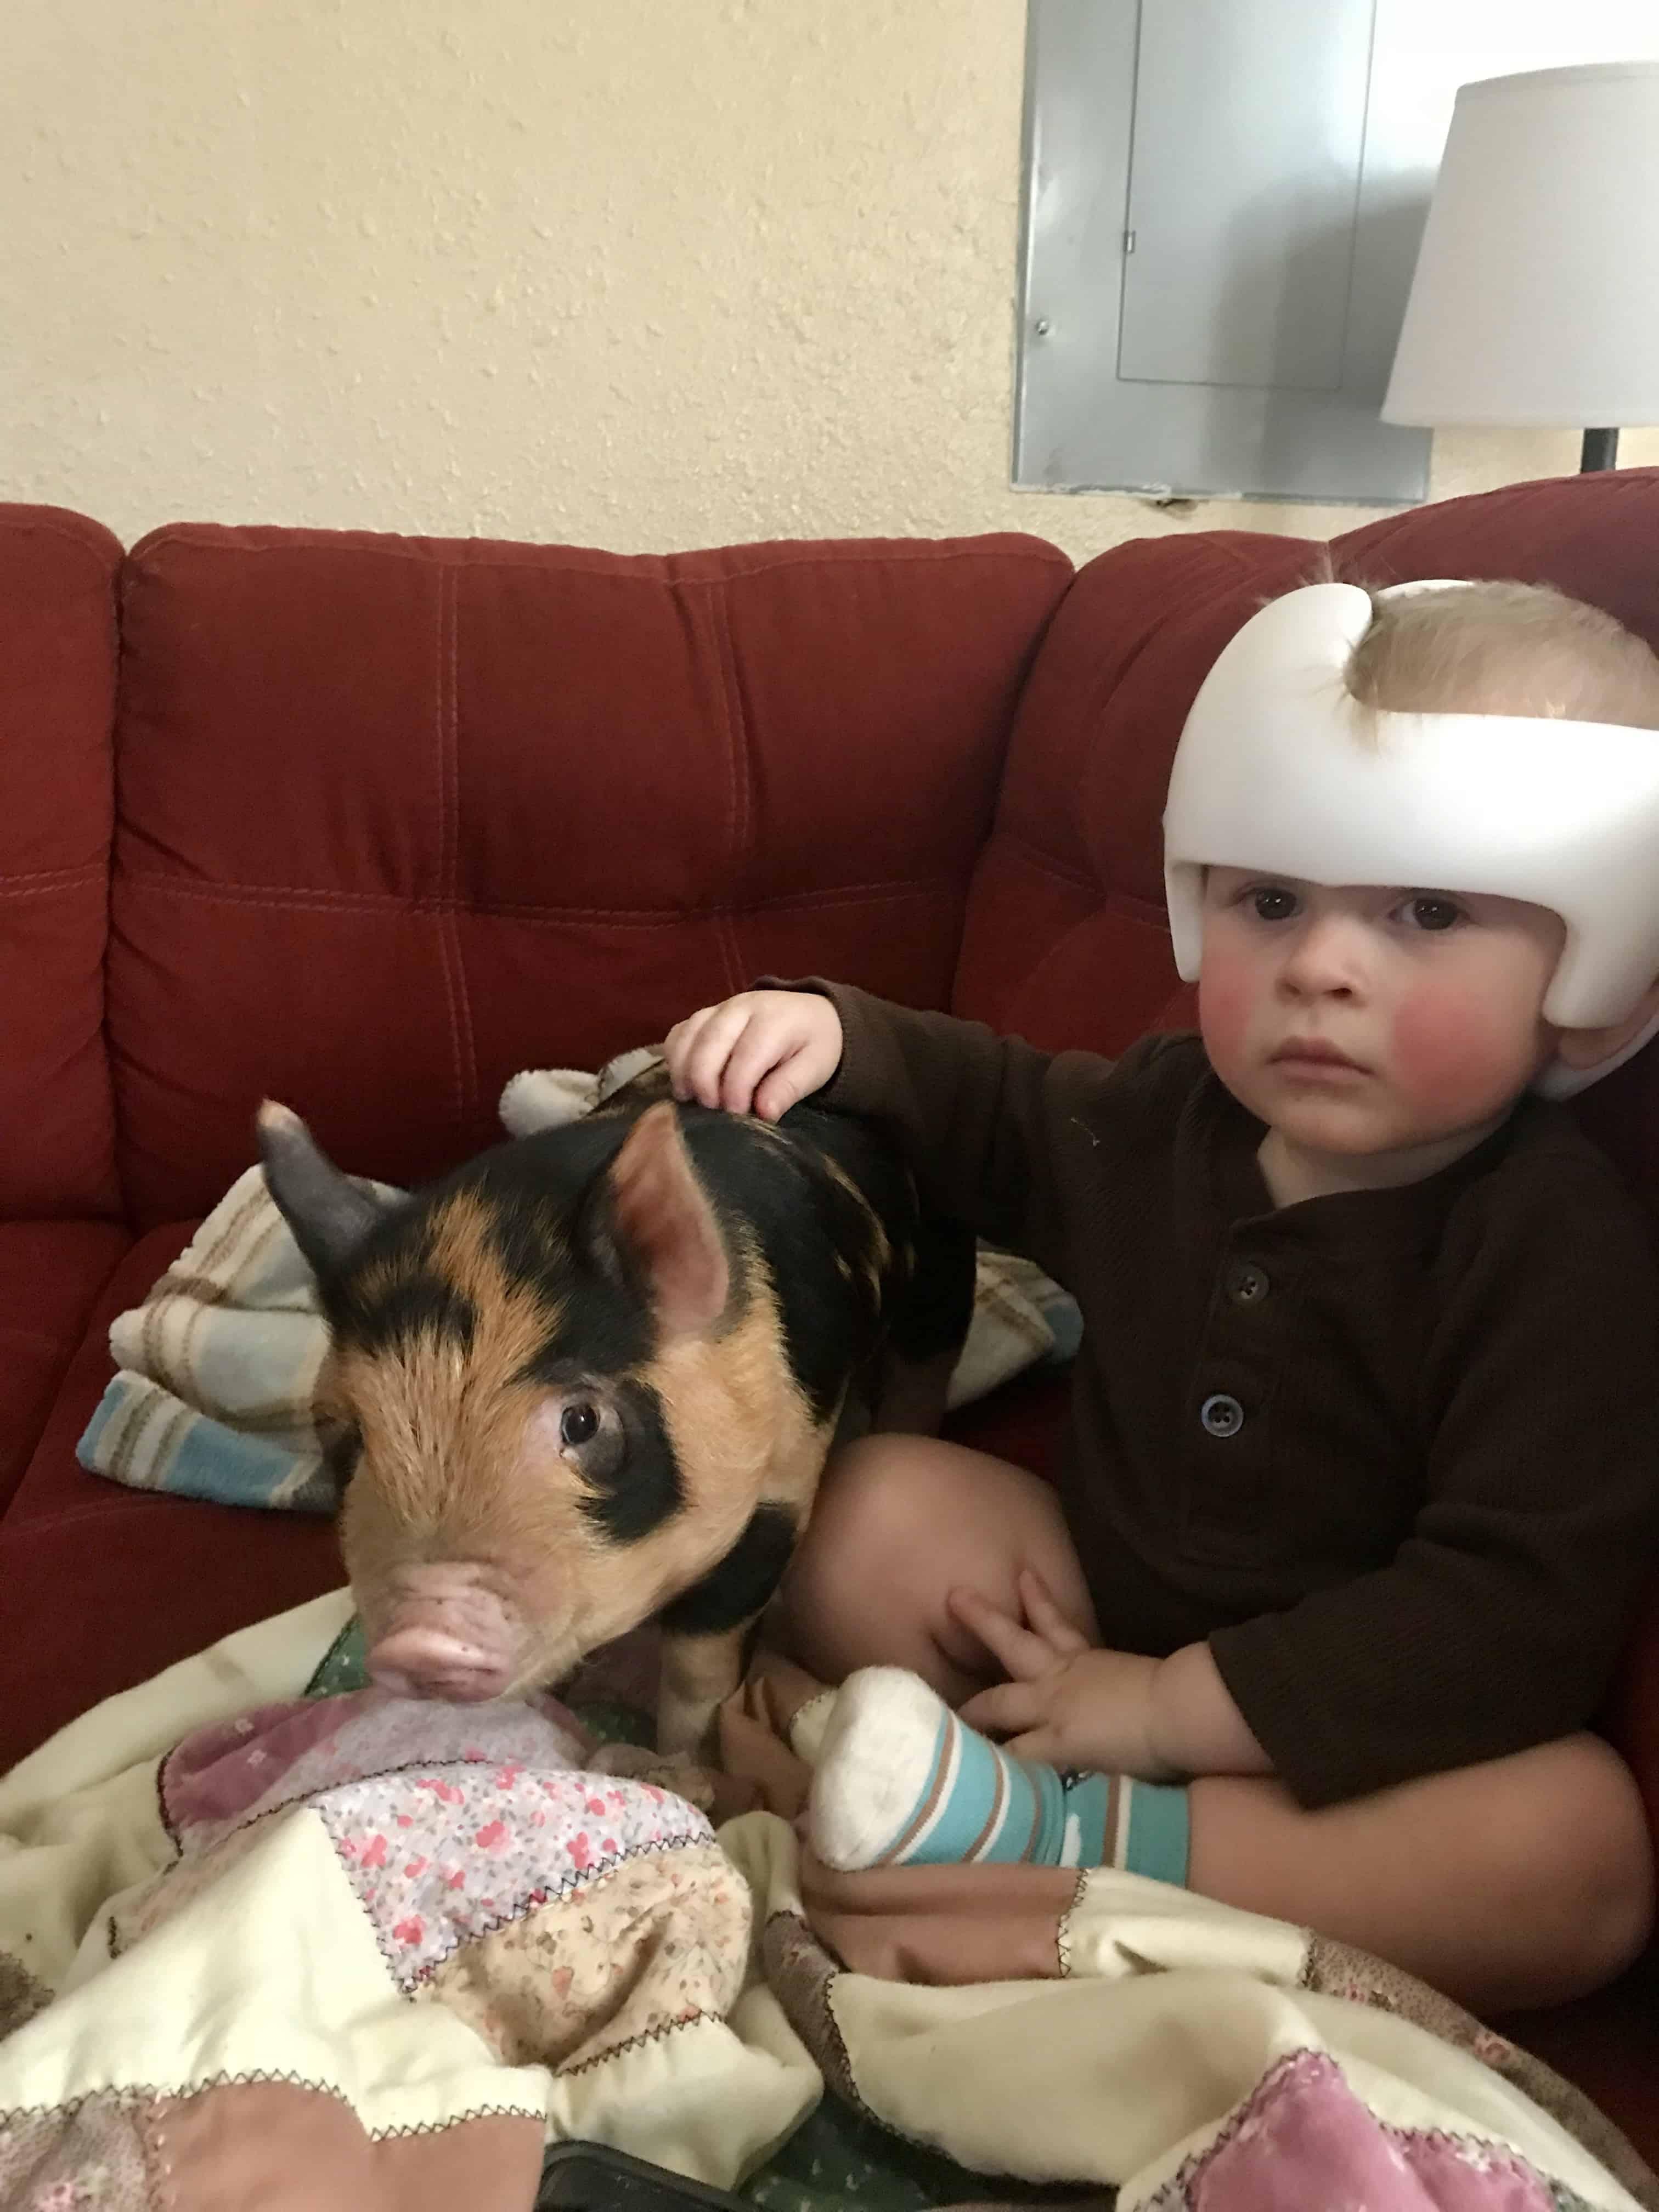 Cranial Helmet FAQ's Answered By A Mom